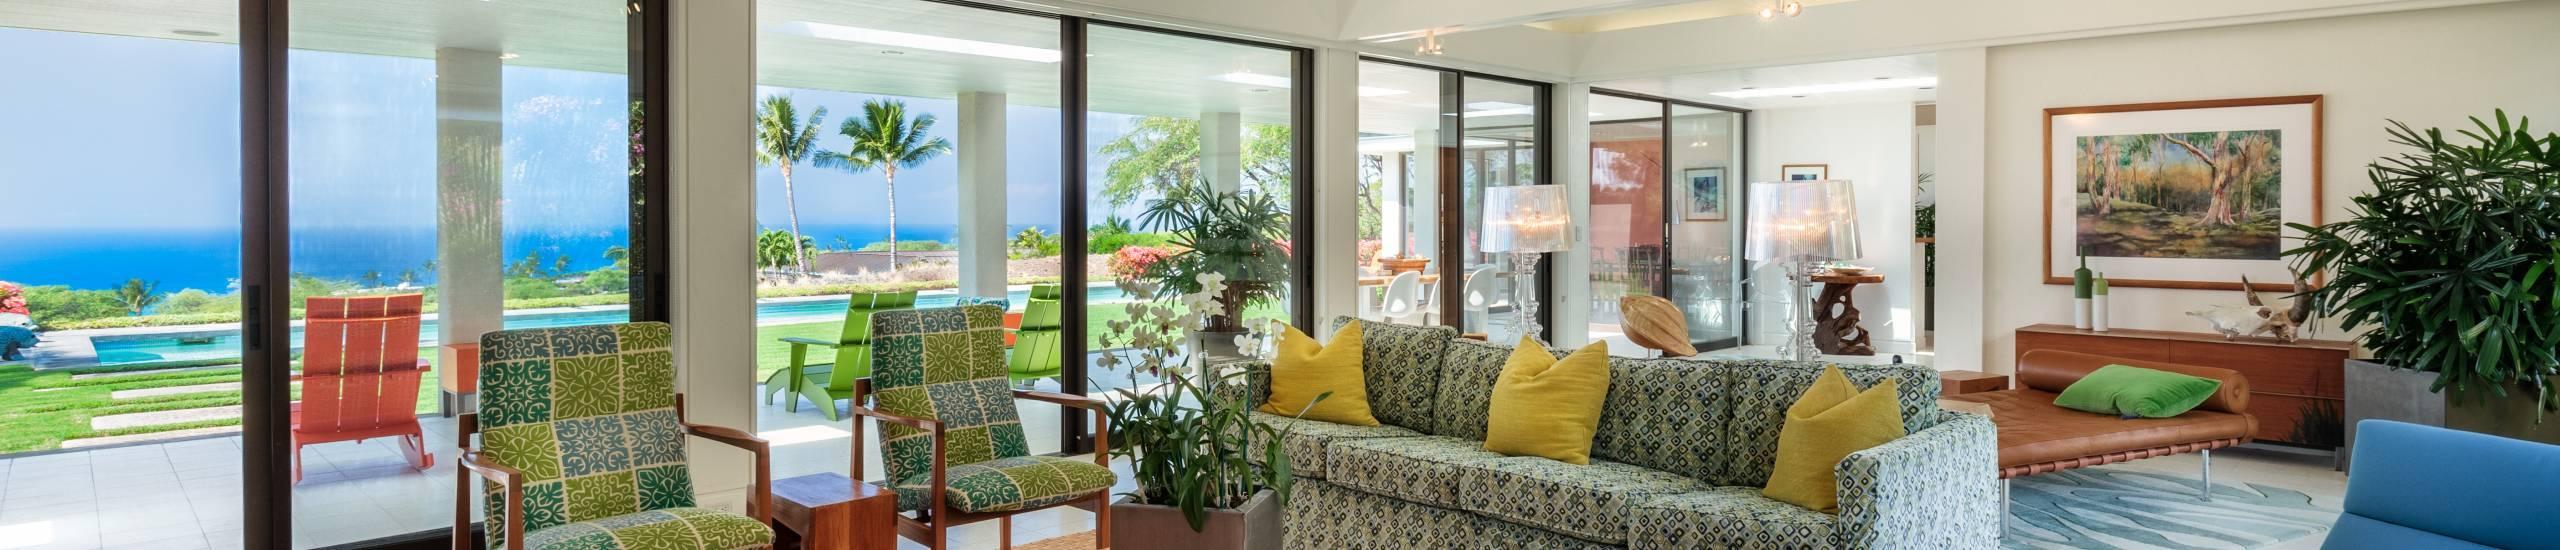 Private Home at Mauna Kea Fairways South